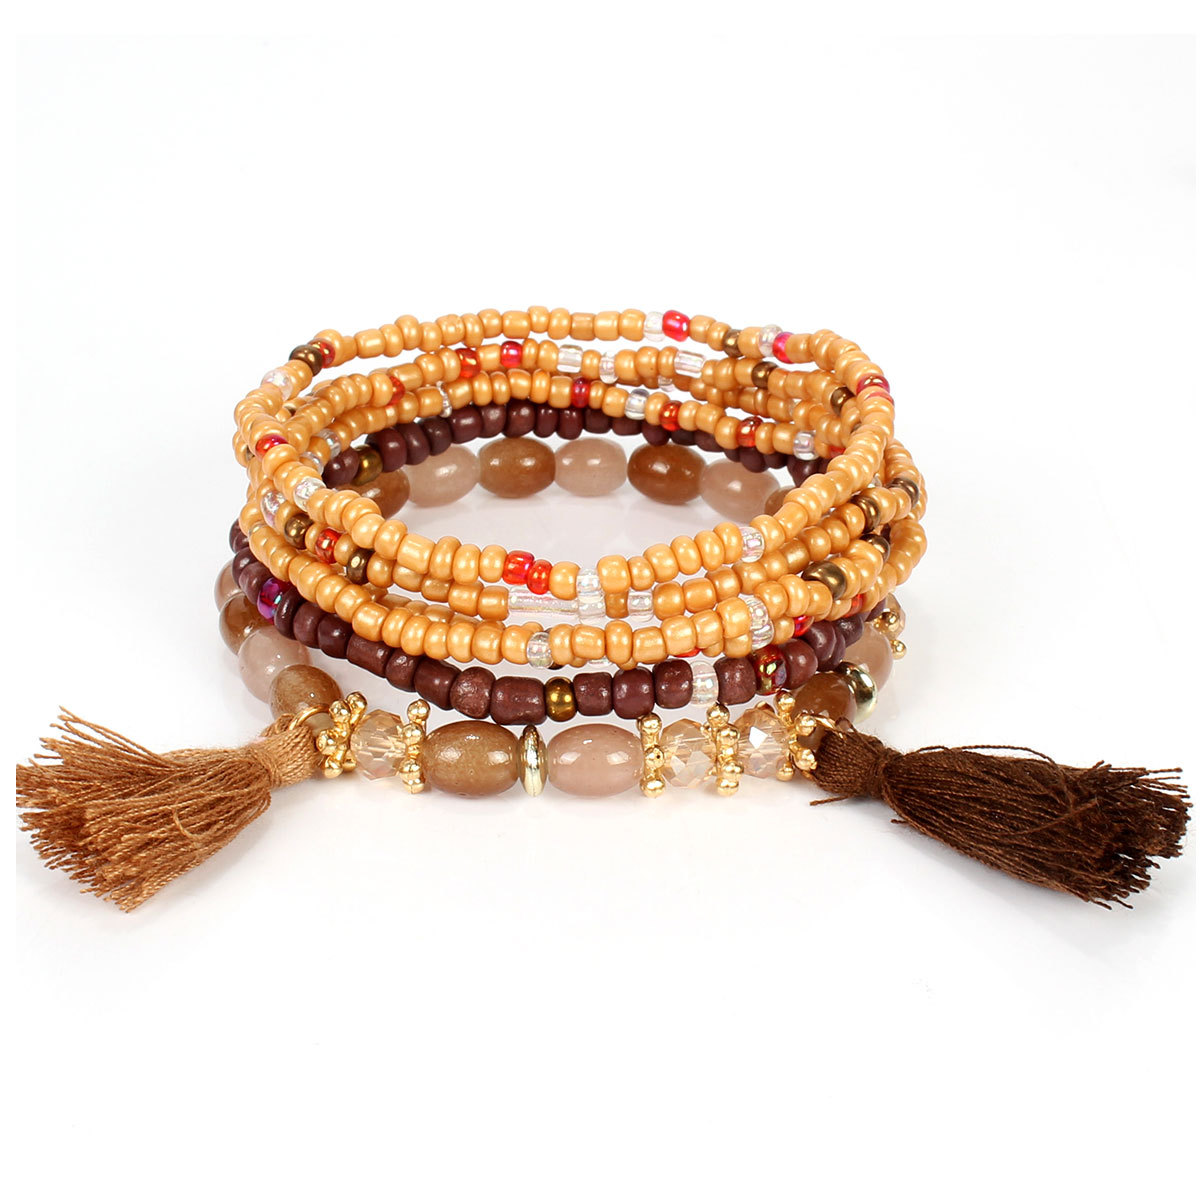 2020 Europe And America Bohemian Style Multilayer Bead Tassels Bracelets Natural Stone Bracelet Pearl Bracelet Charm Bracelets Aliexpress